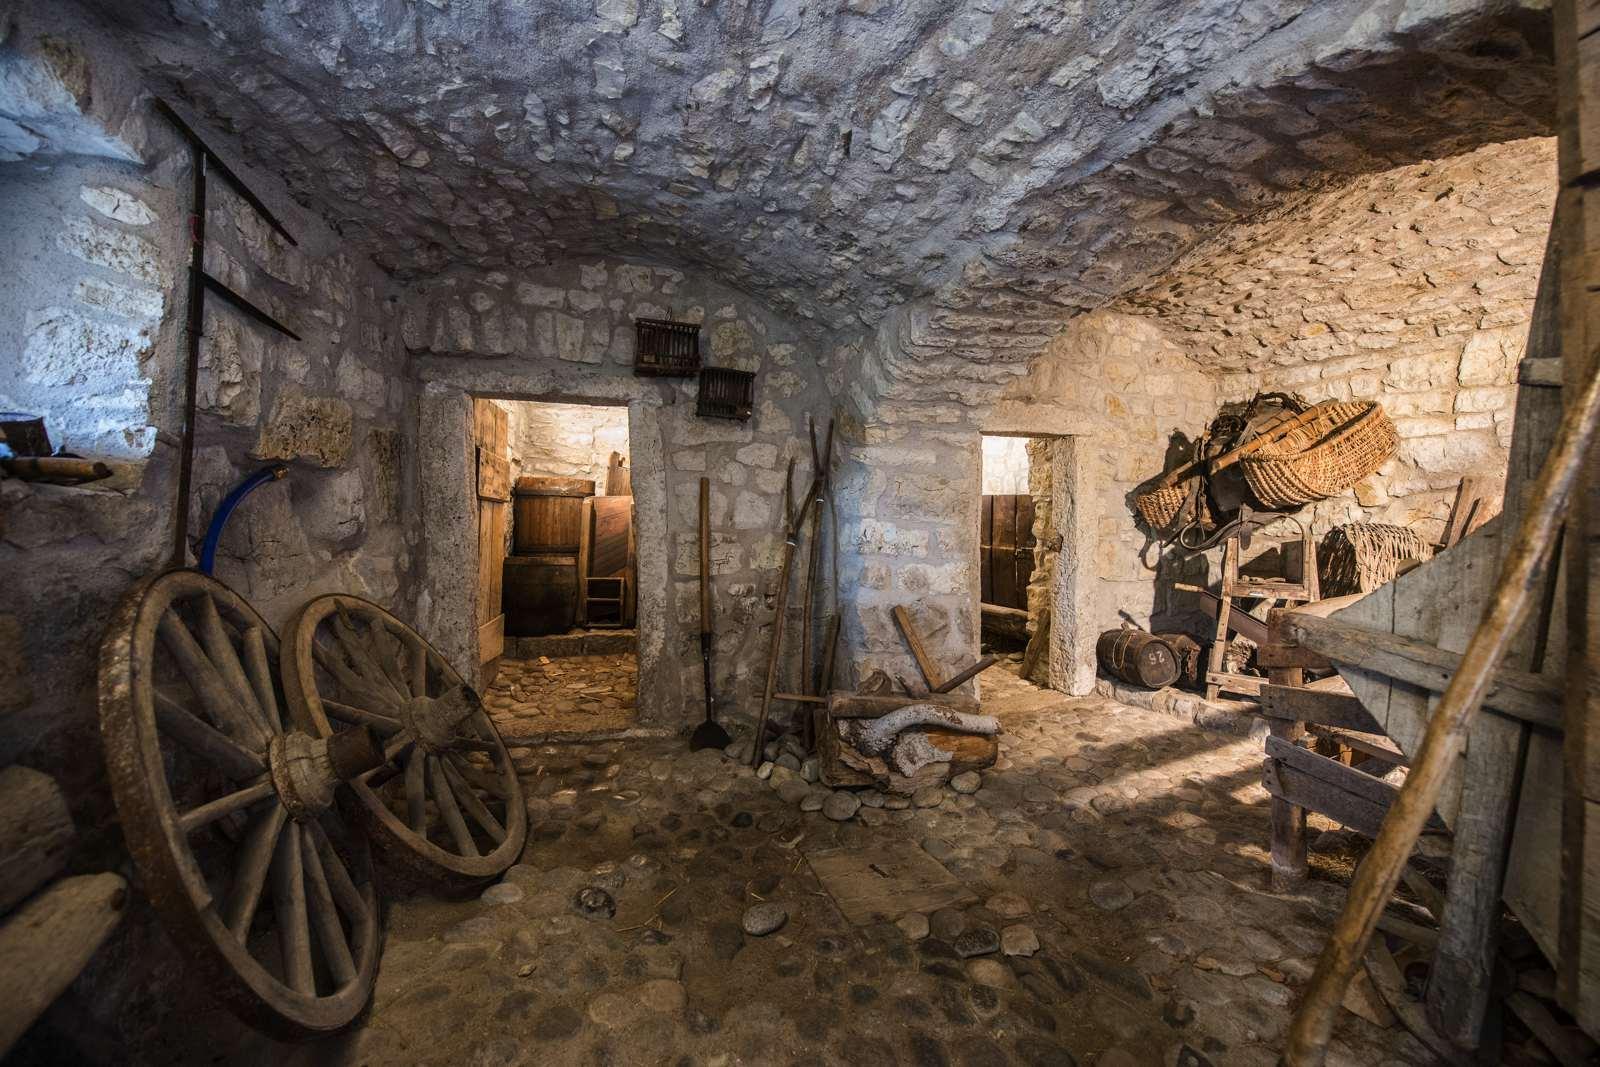 Casa Museo - Haus von Prükk a Luserna, Altipiani Cimbri